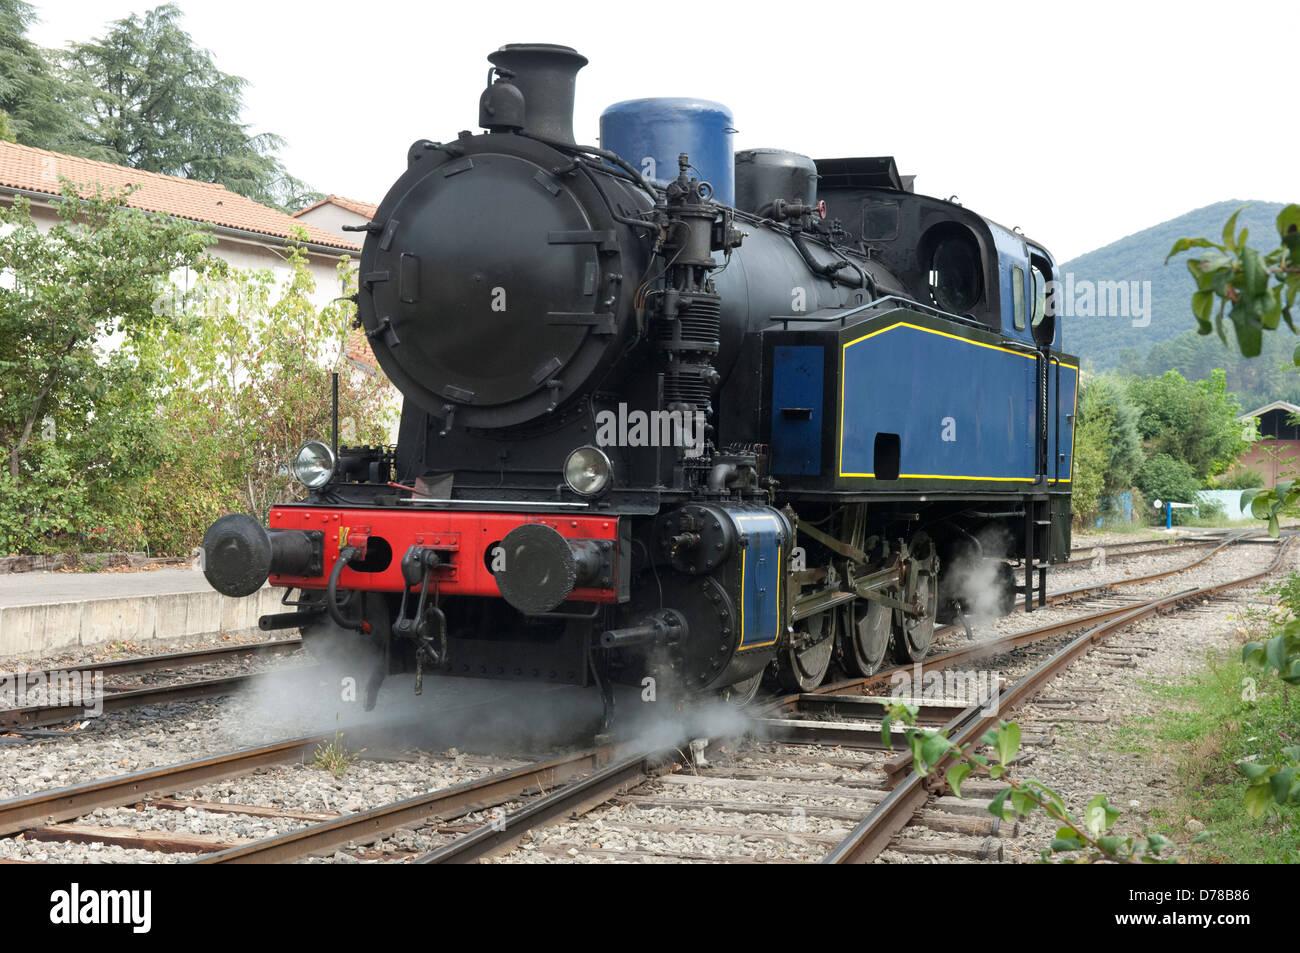 Henschel 040T 2524 steam locomotive approaching station at St Jean du Gard  in the Gard (30) departement of France.